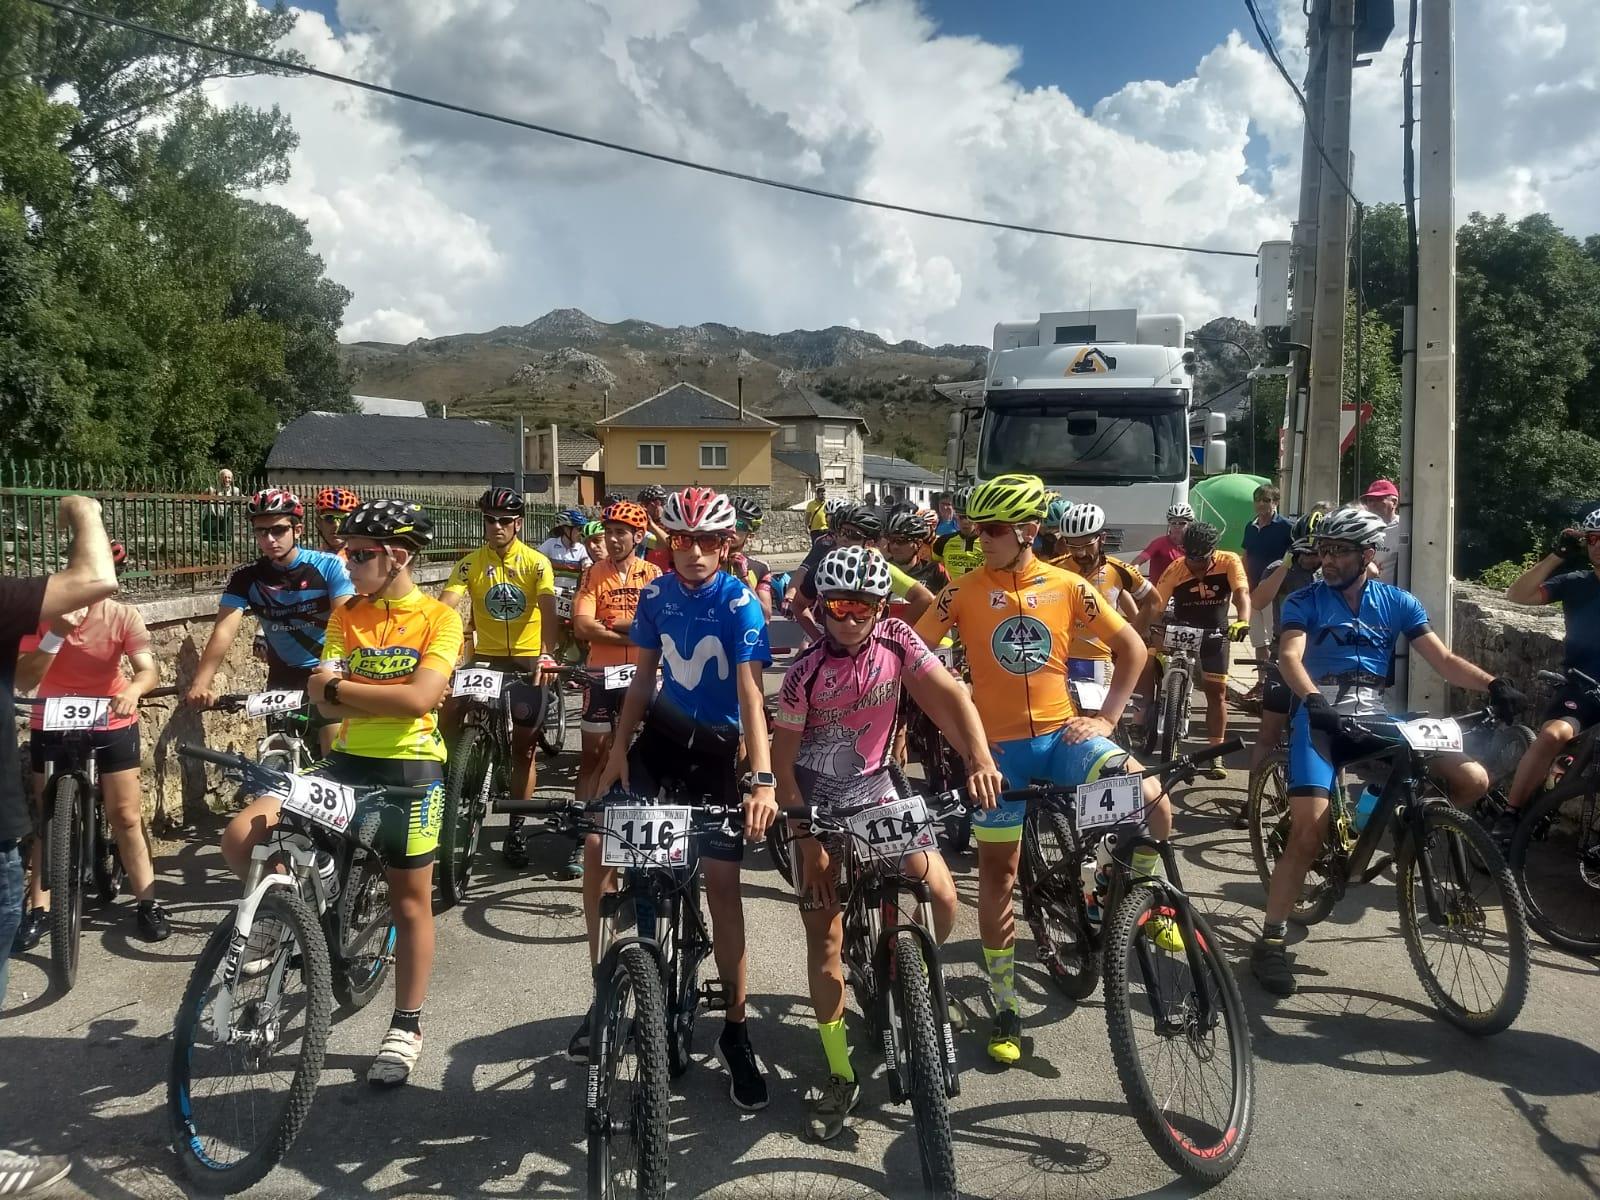 Circuito Leones Btt : Equipo leonés de trail running tortugas trail leÓn i circuito